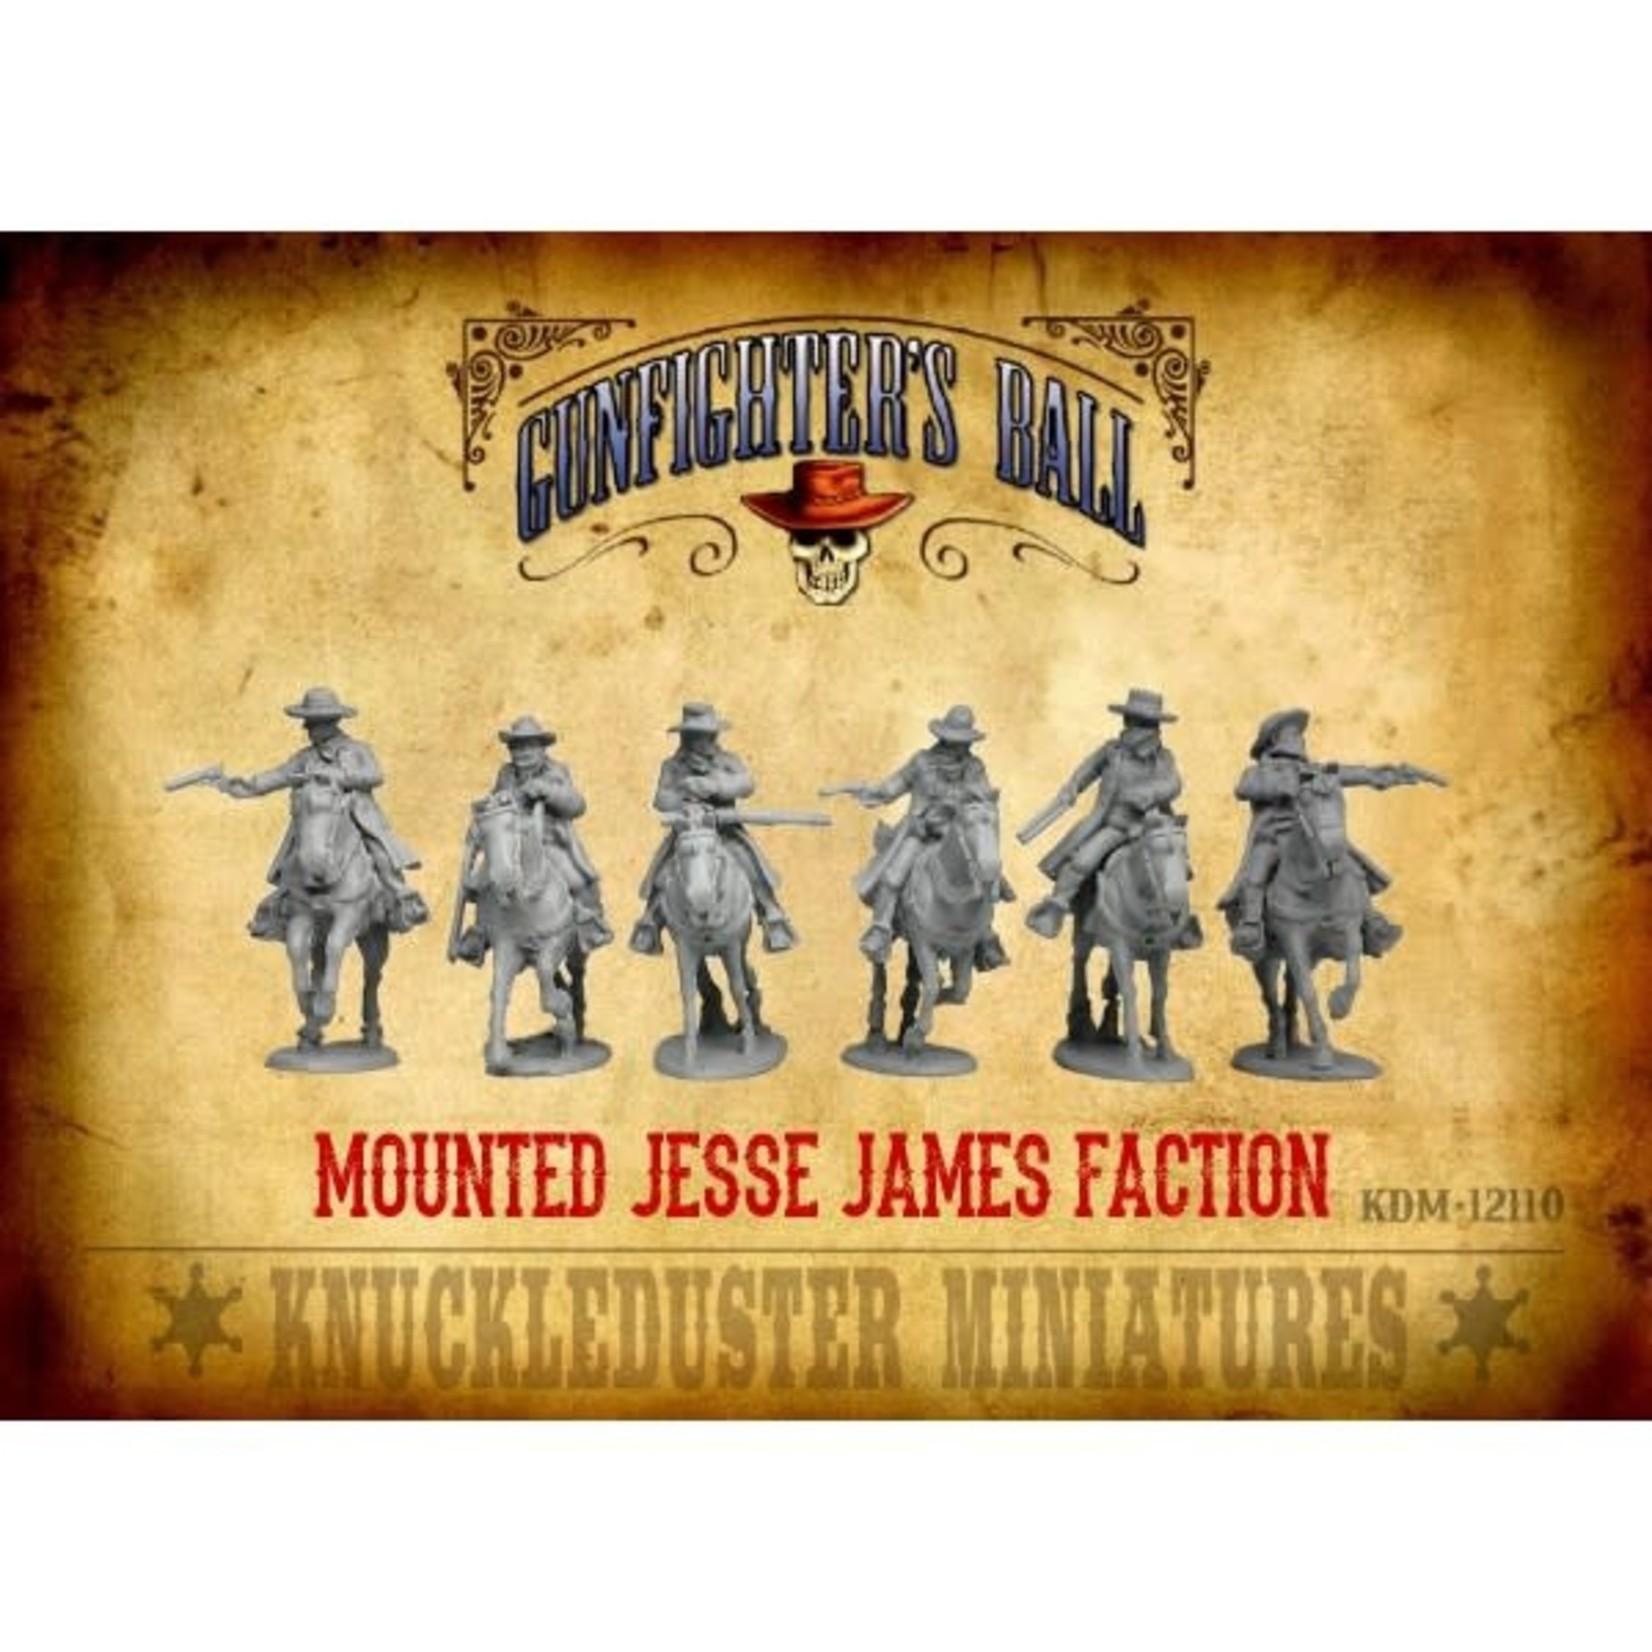 Jesse James Faction Mounted